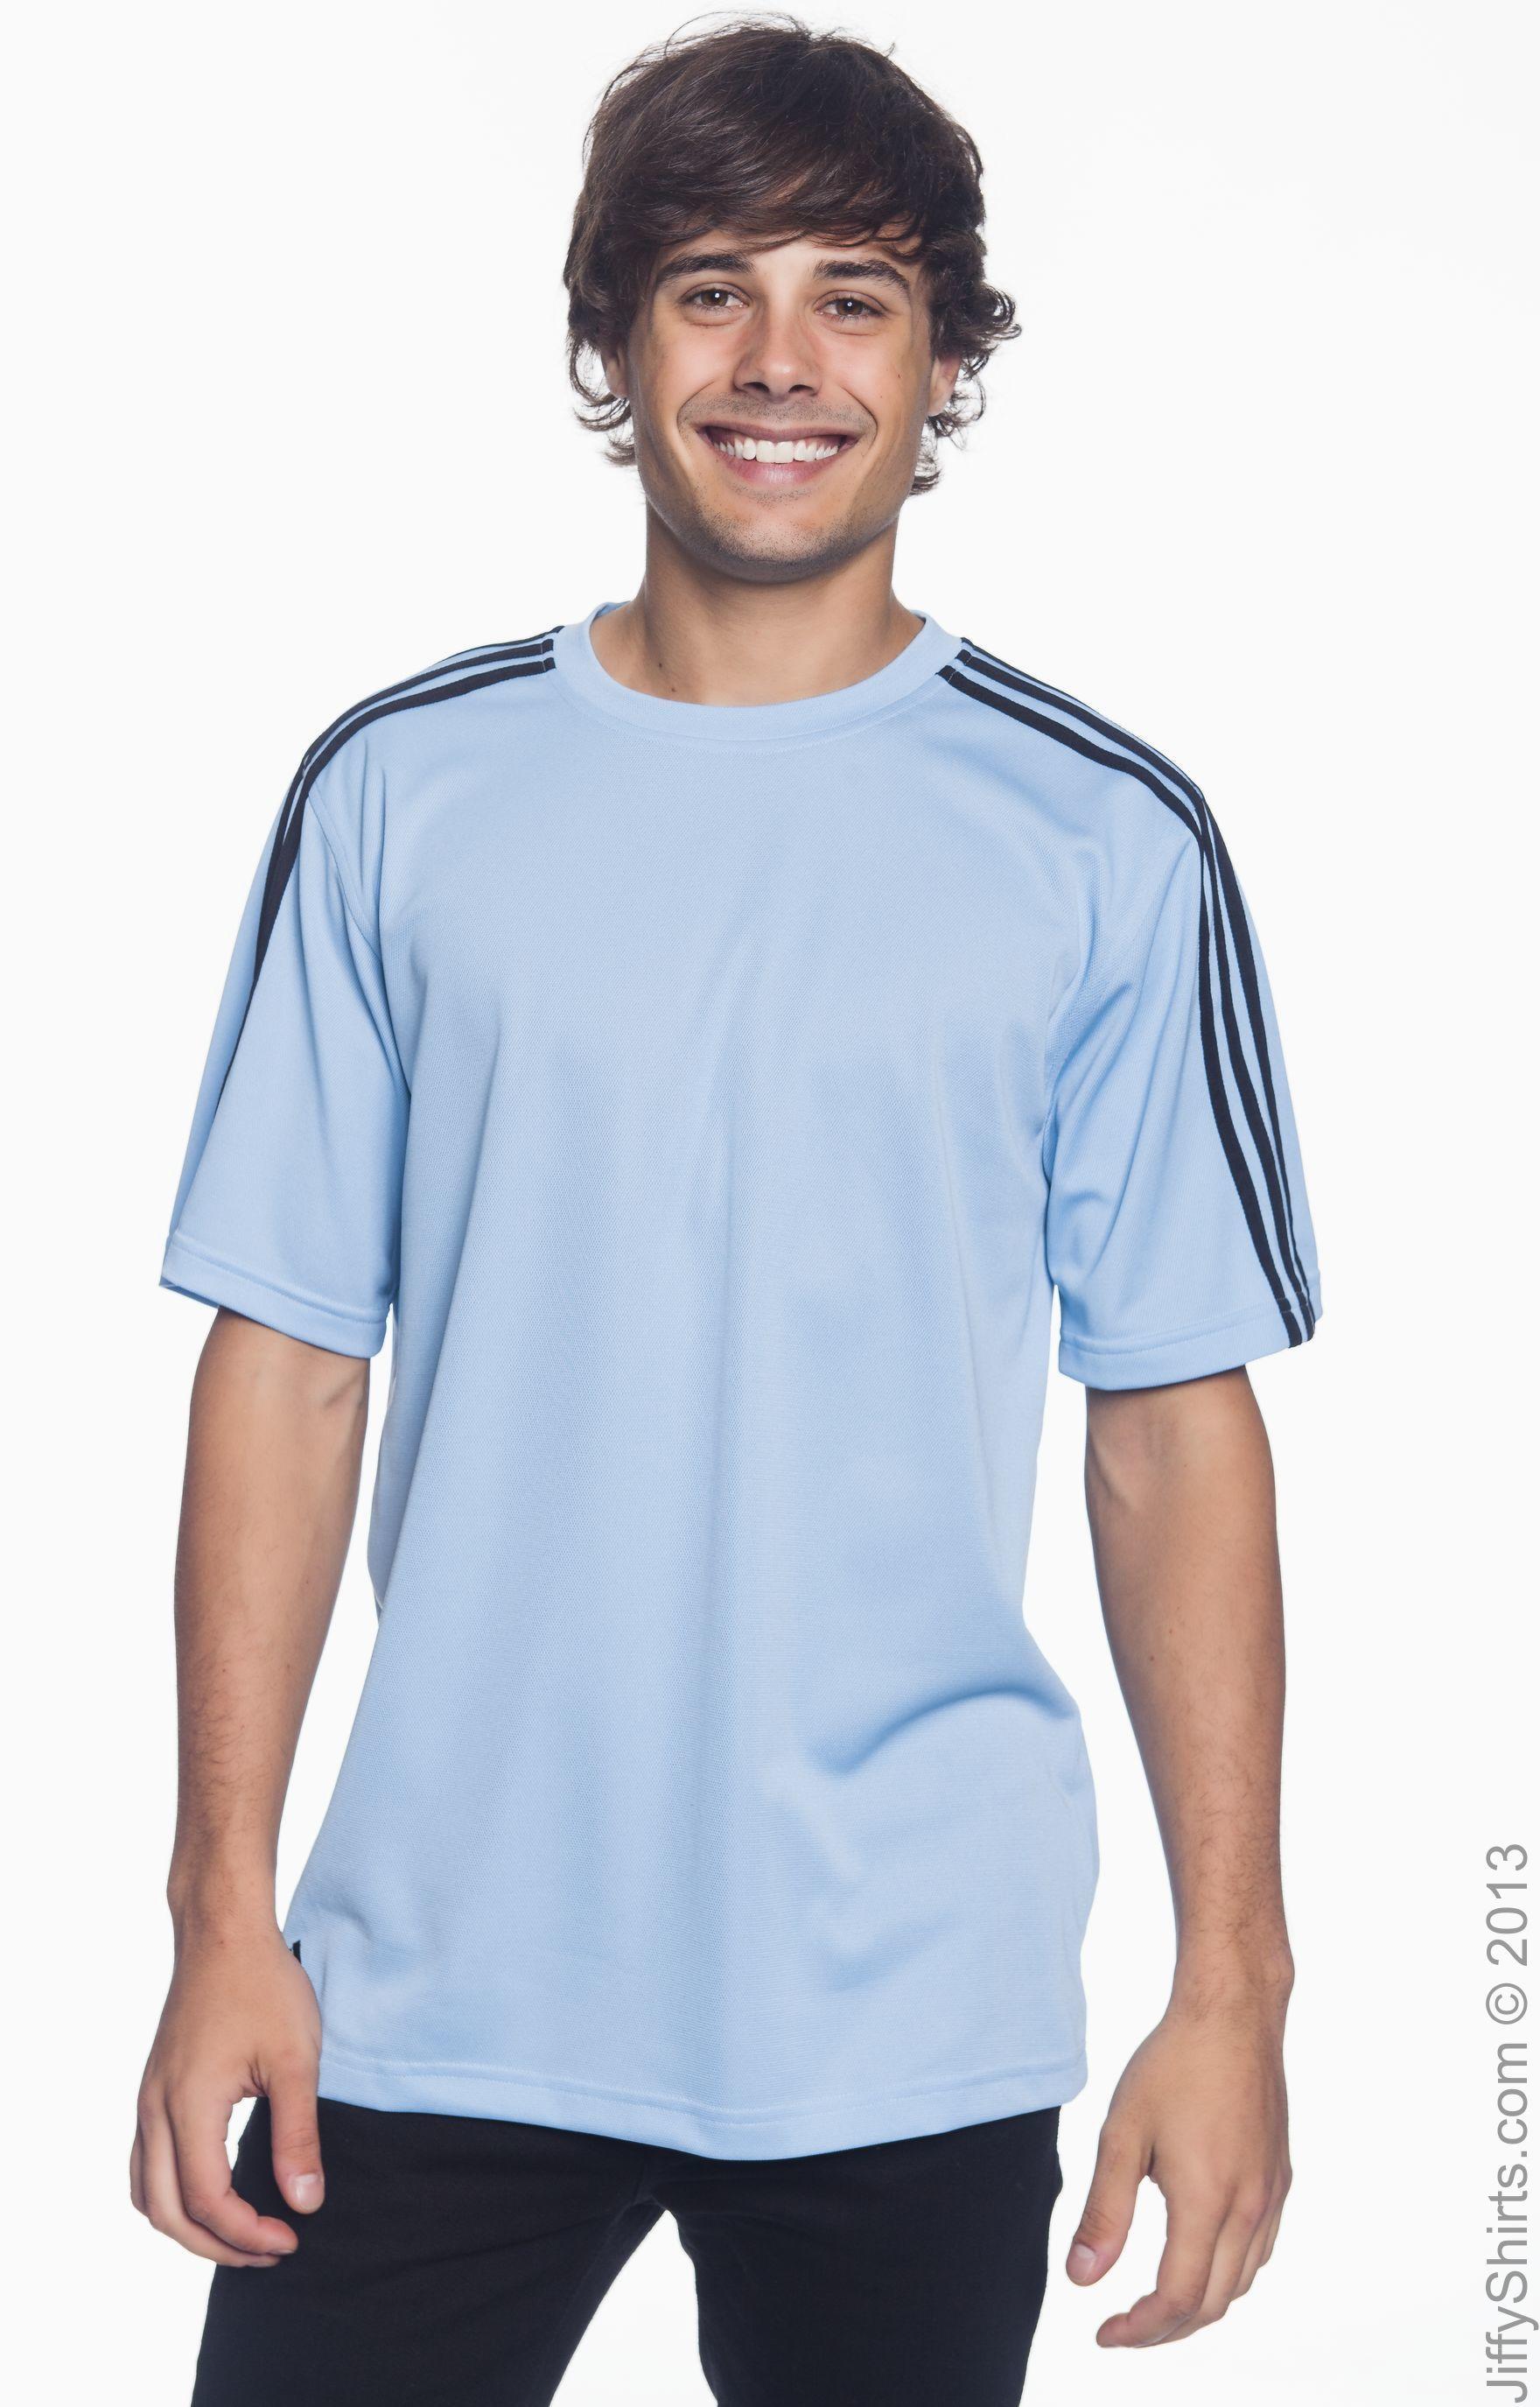 Adidas A72 White Black Men's climalite 3 Stripes T Shirt